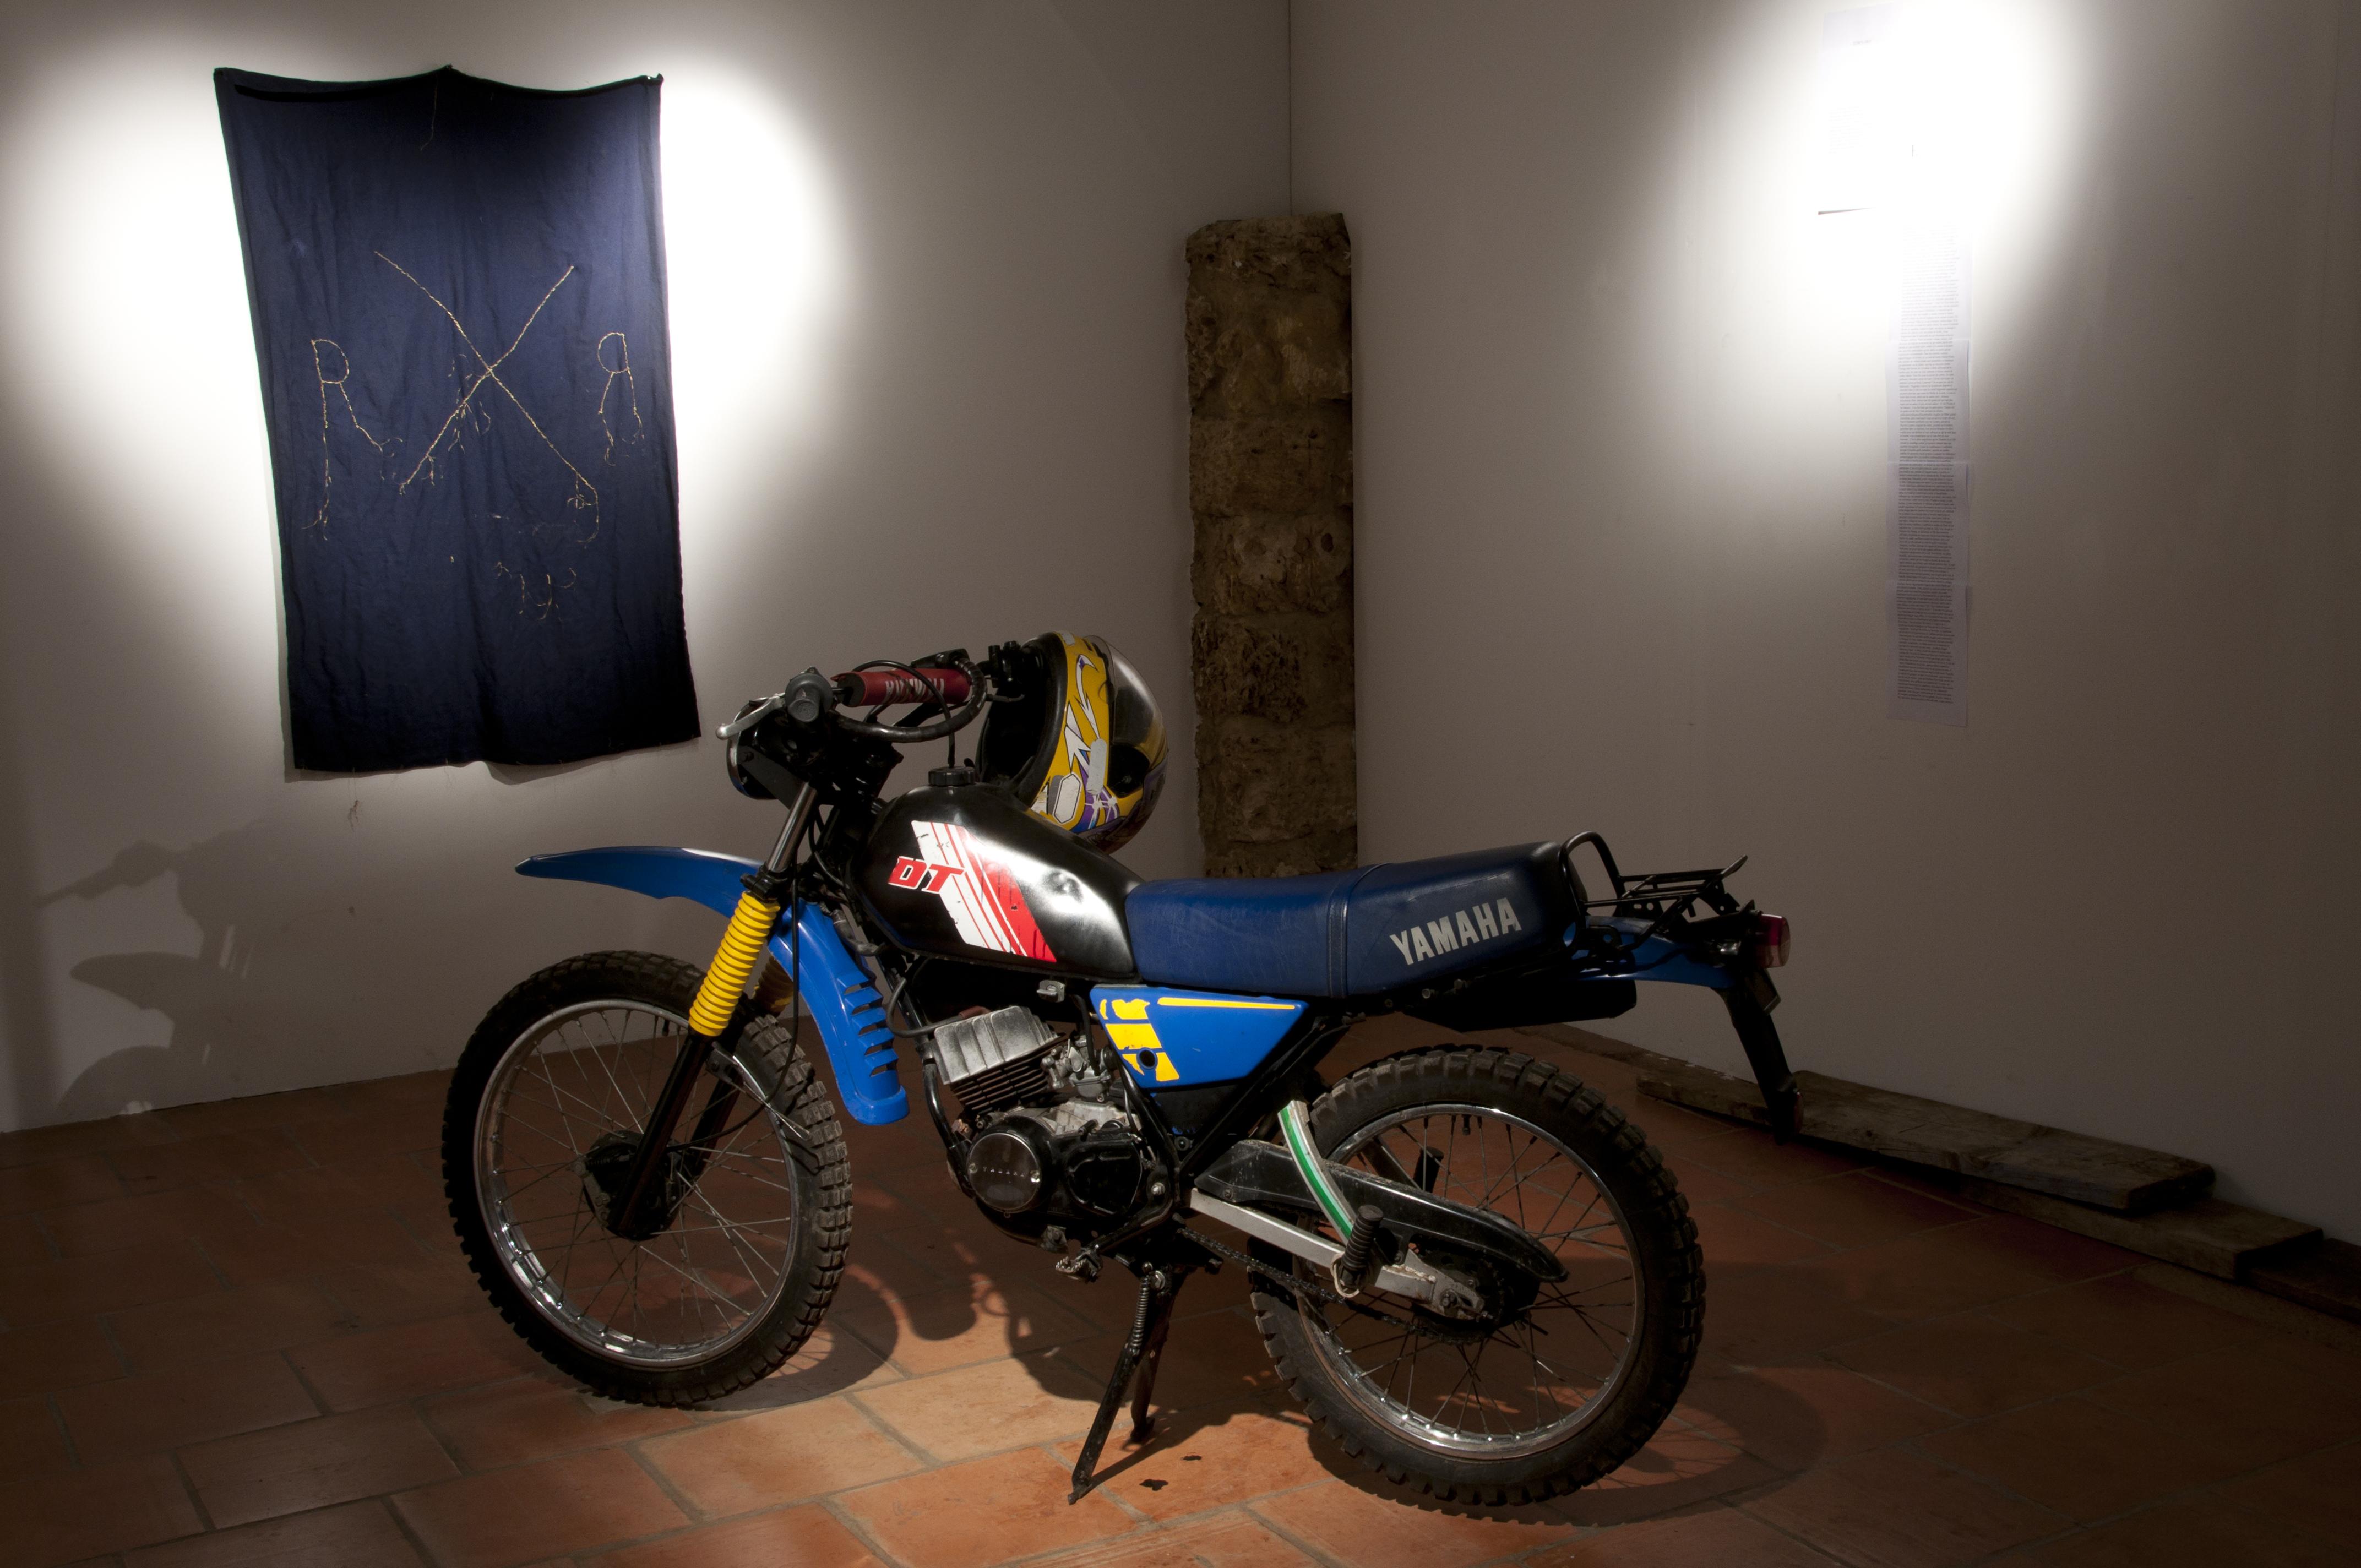 Exposition Boris Geoffroy